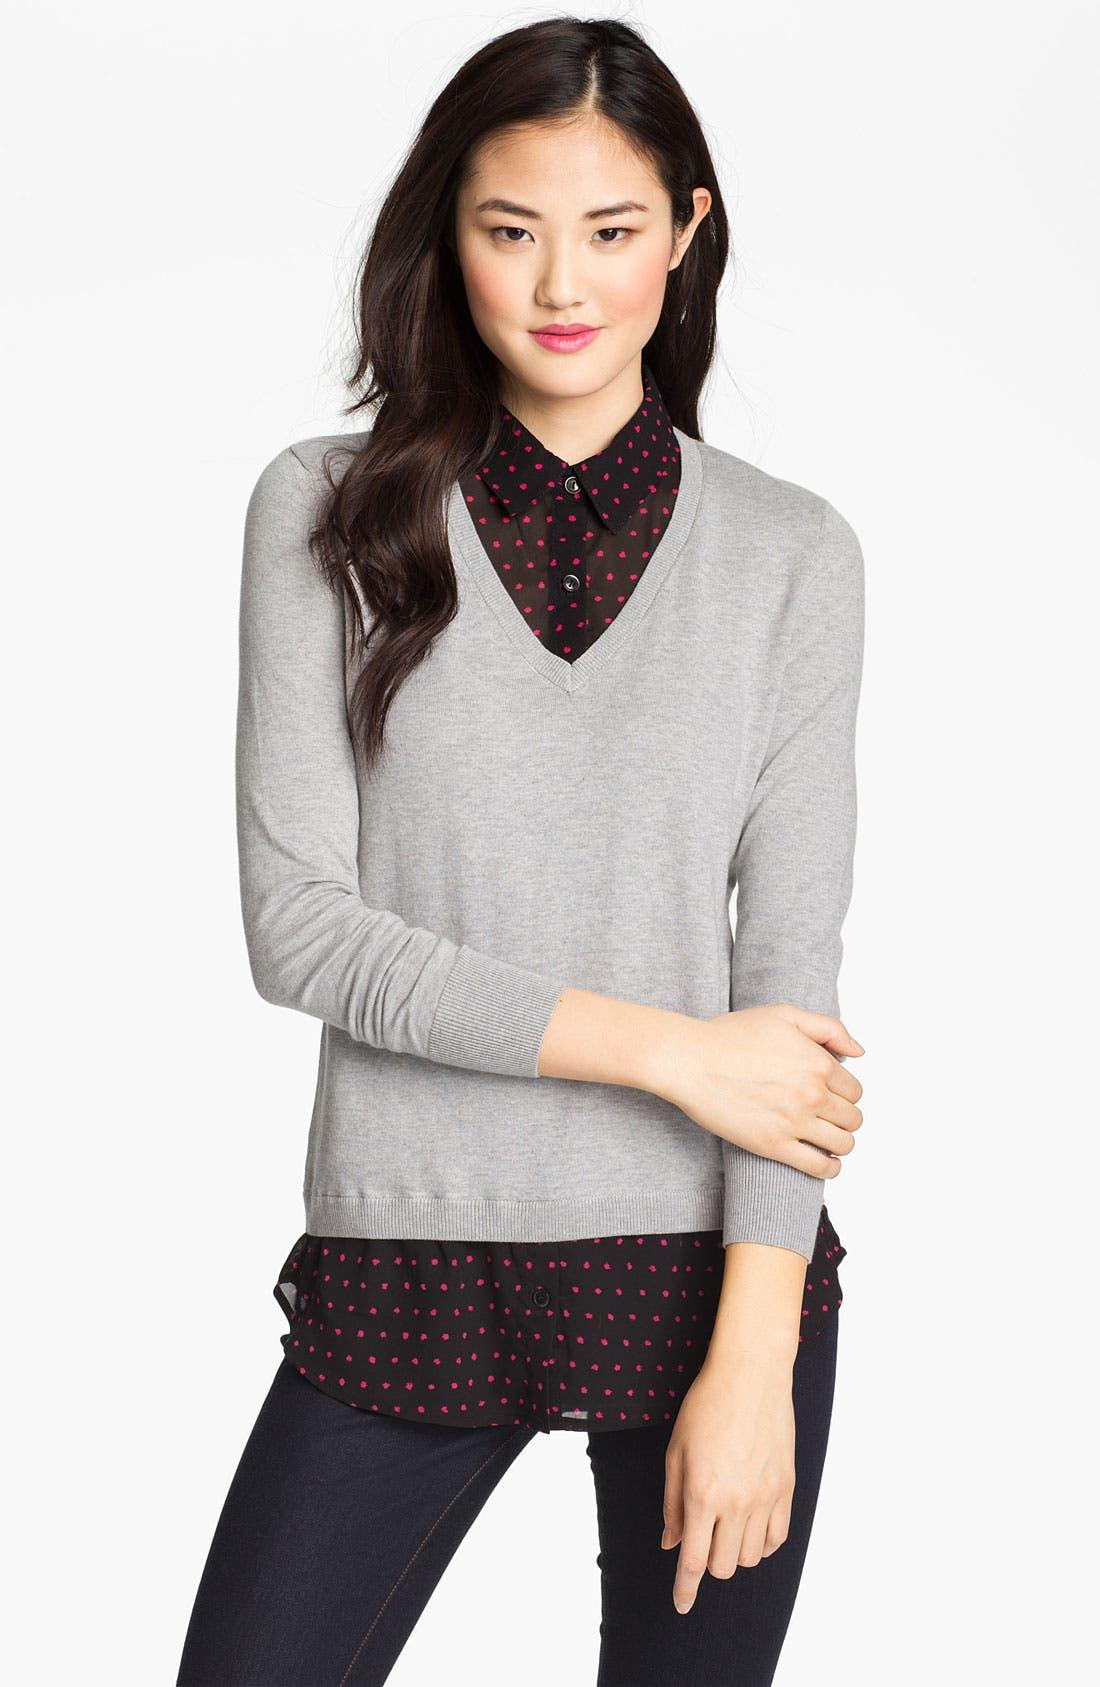 Main Image - Halogen Mock Sweater & Blouse Set